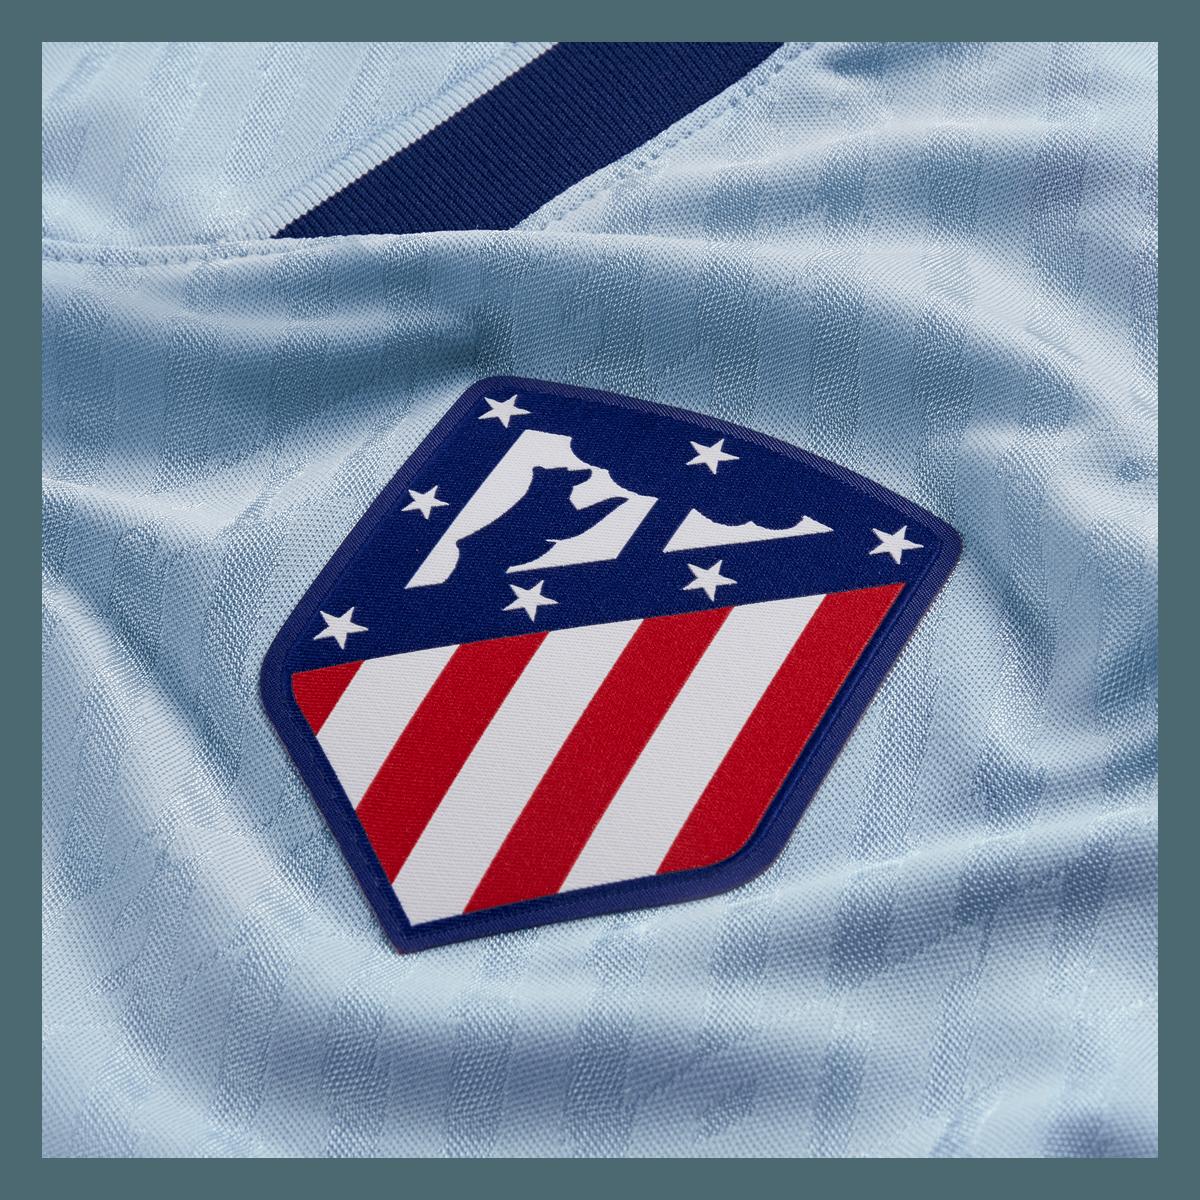 Nike Atlético Madrid Herren HeimAuswärts Short 201920 dunkelblaurot